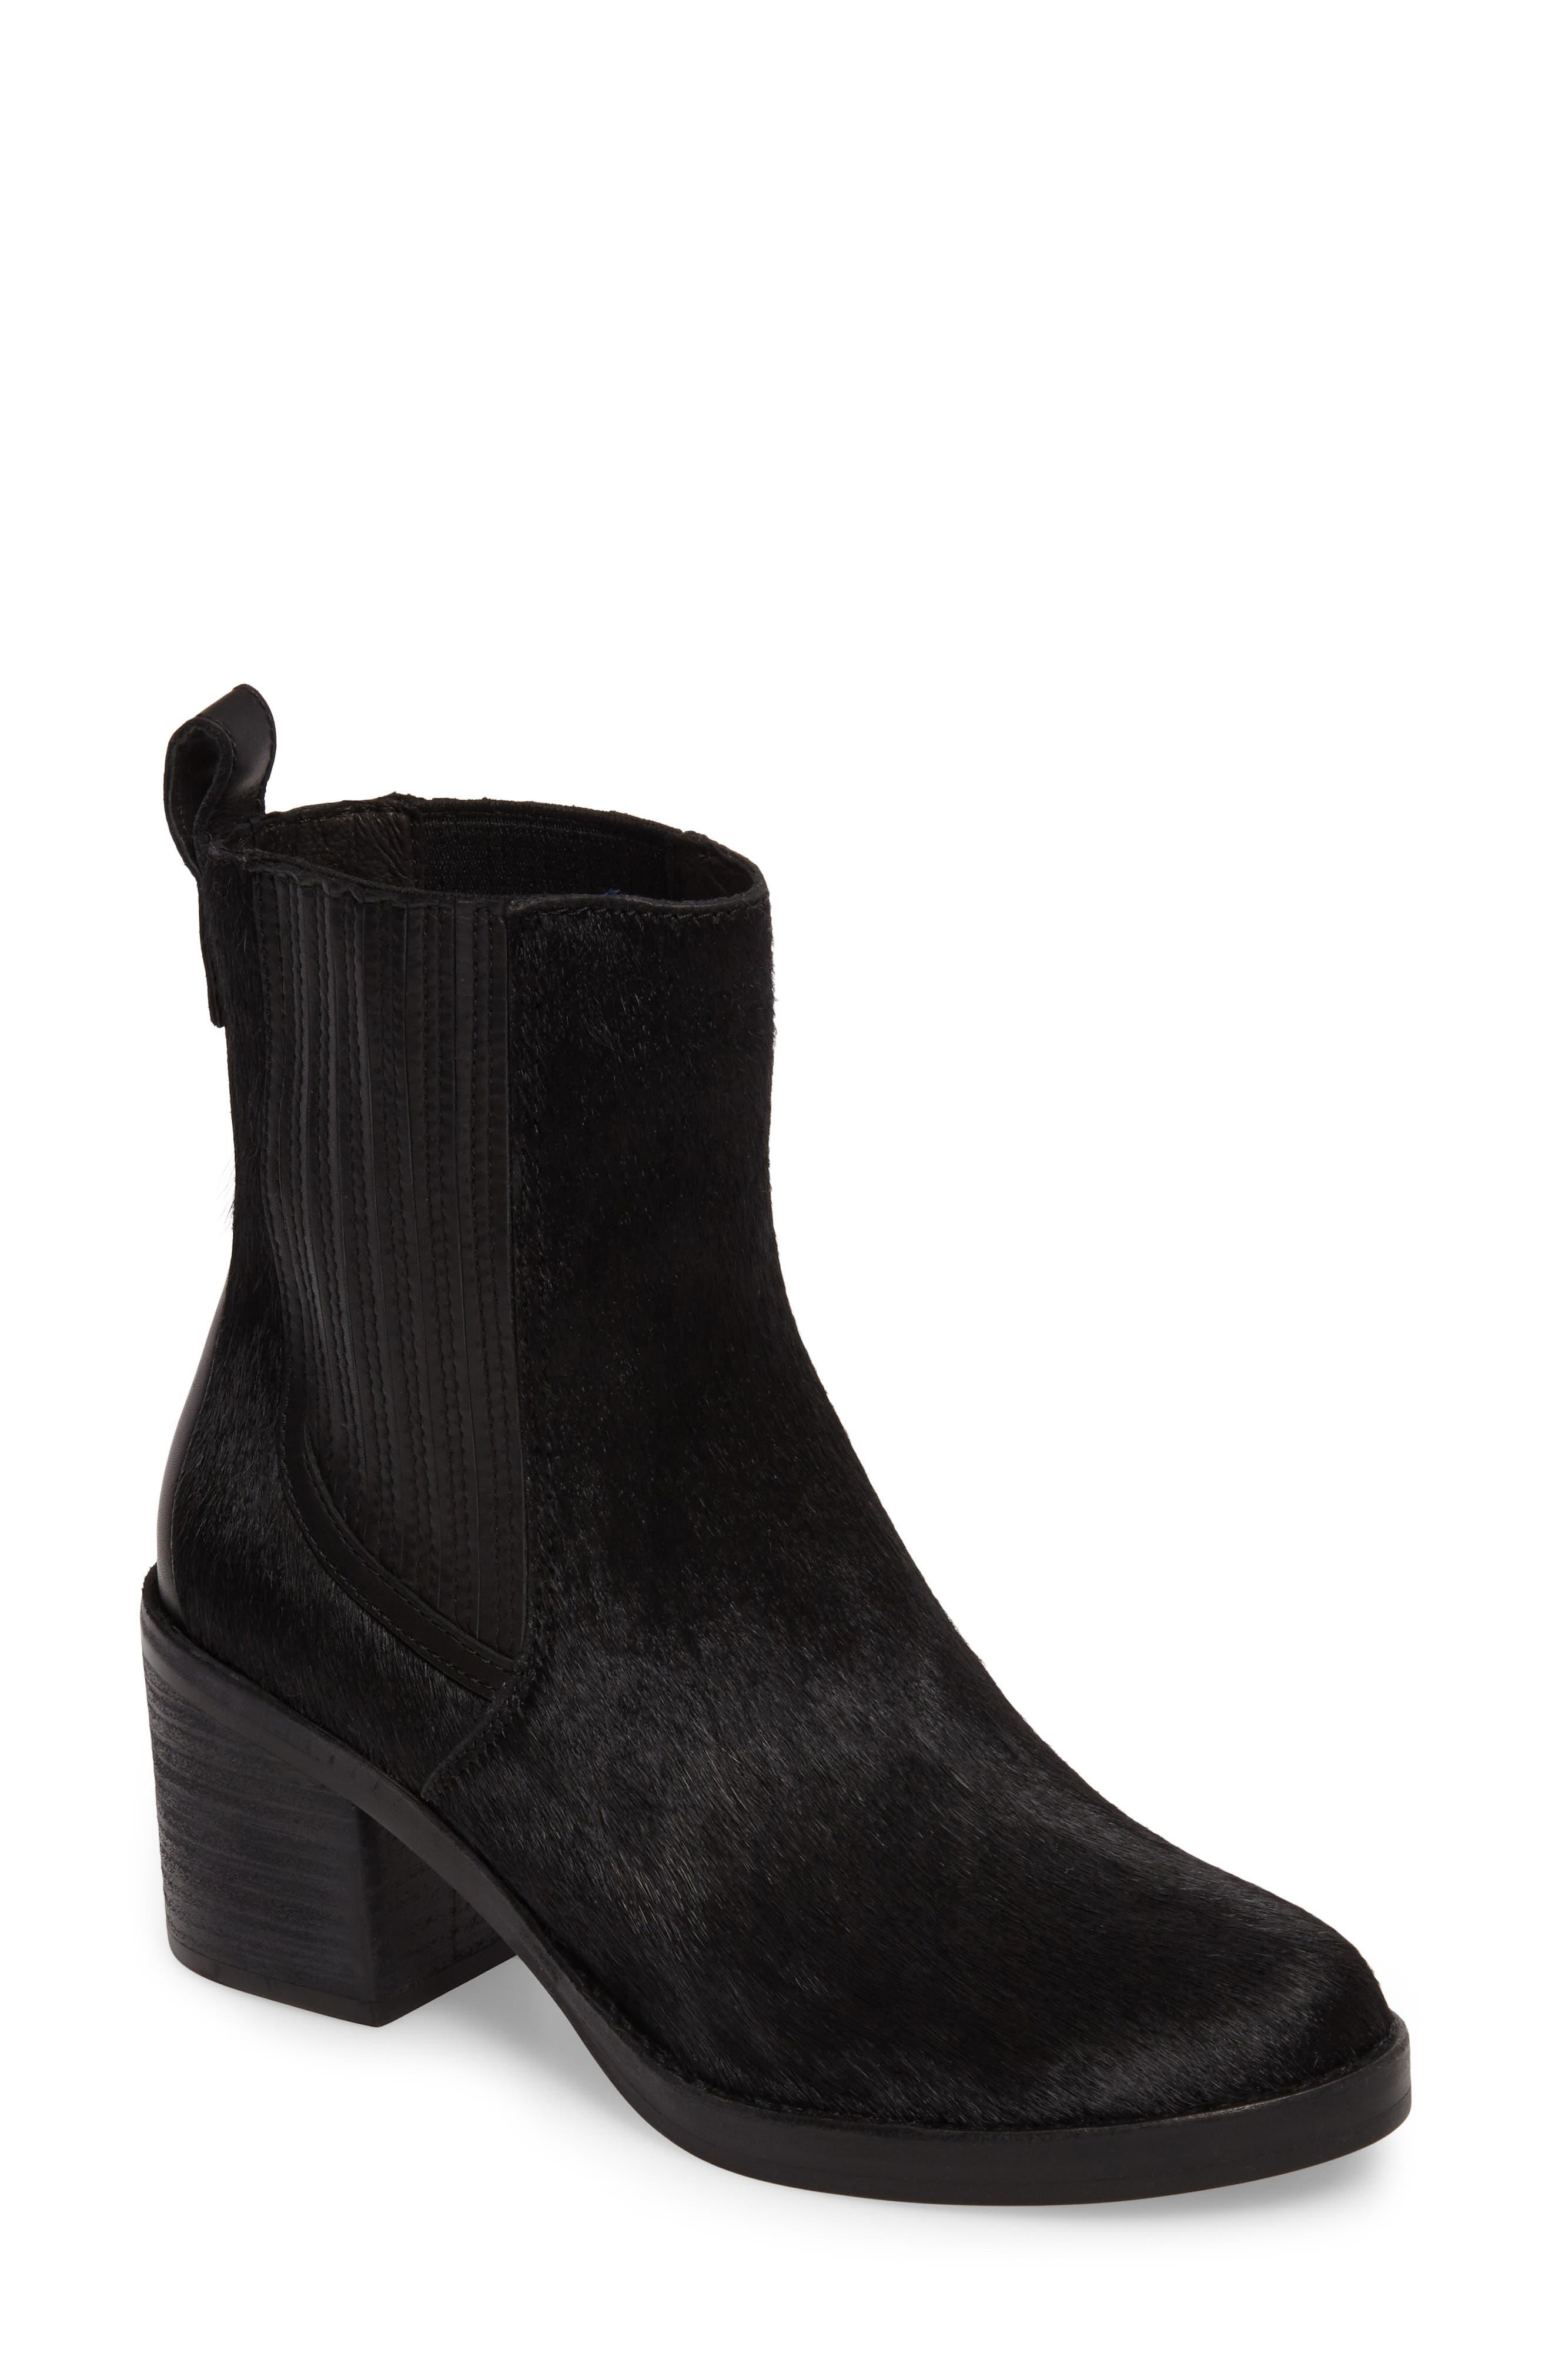 Camden Genuine Calf Hair Chelsea Boot,                         Main,                         color, Black Calf Hair Leather